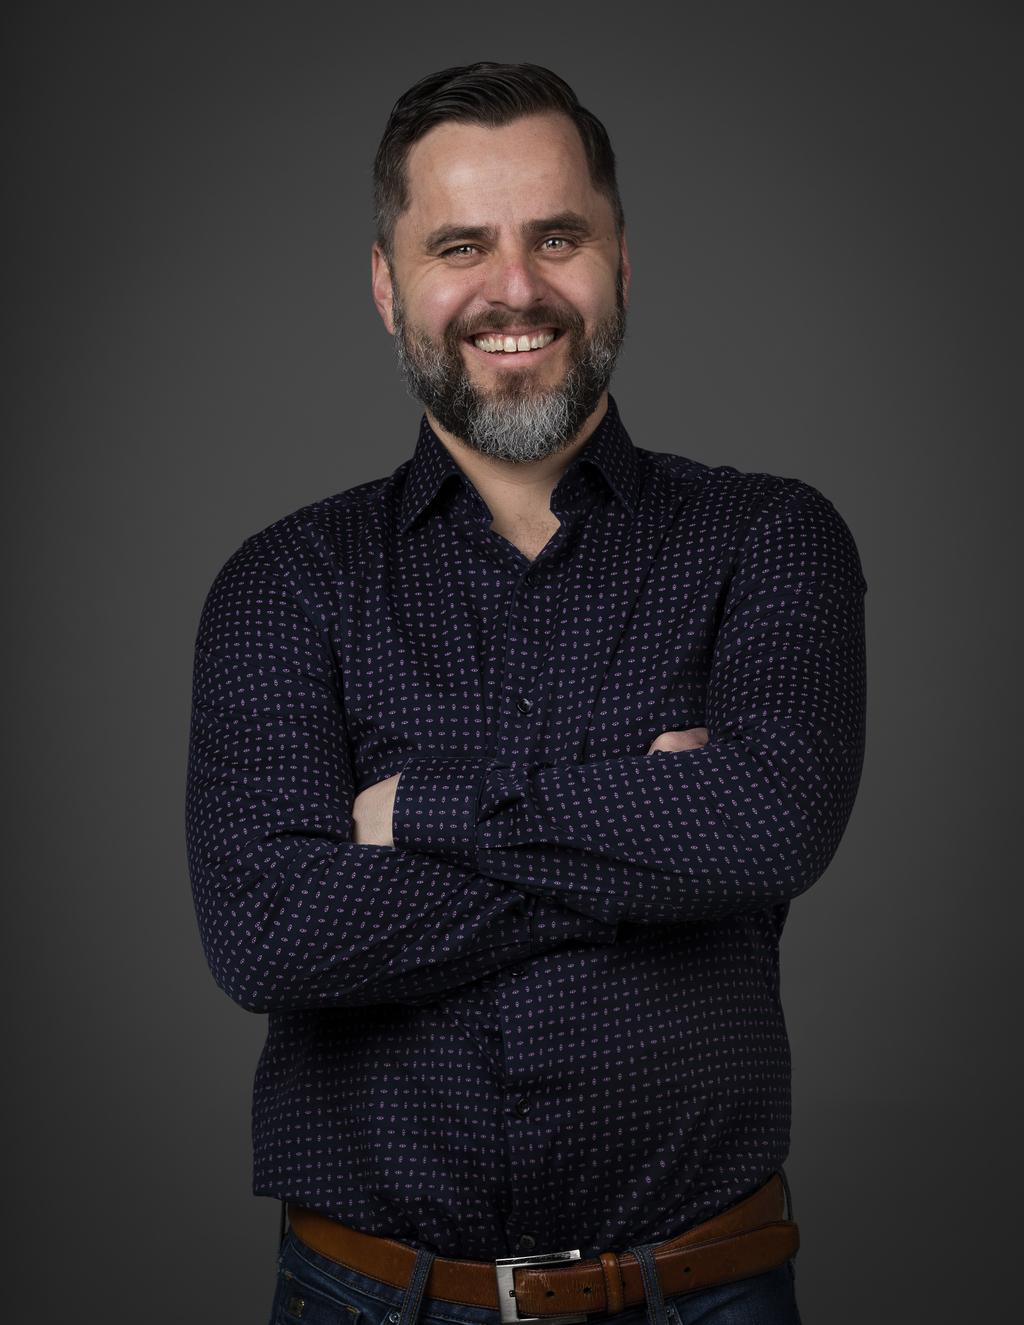 Gunnar Kyvik